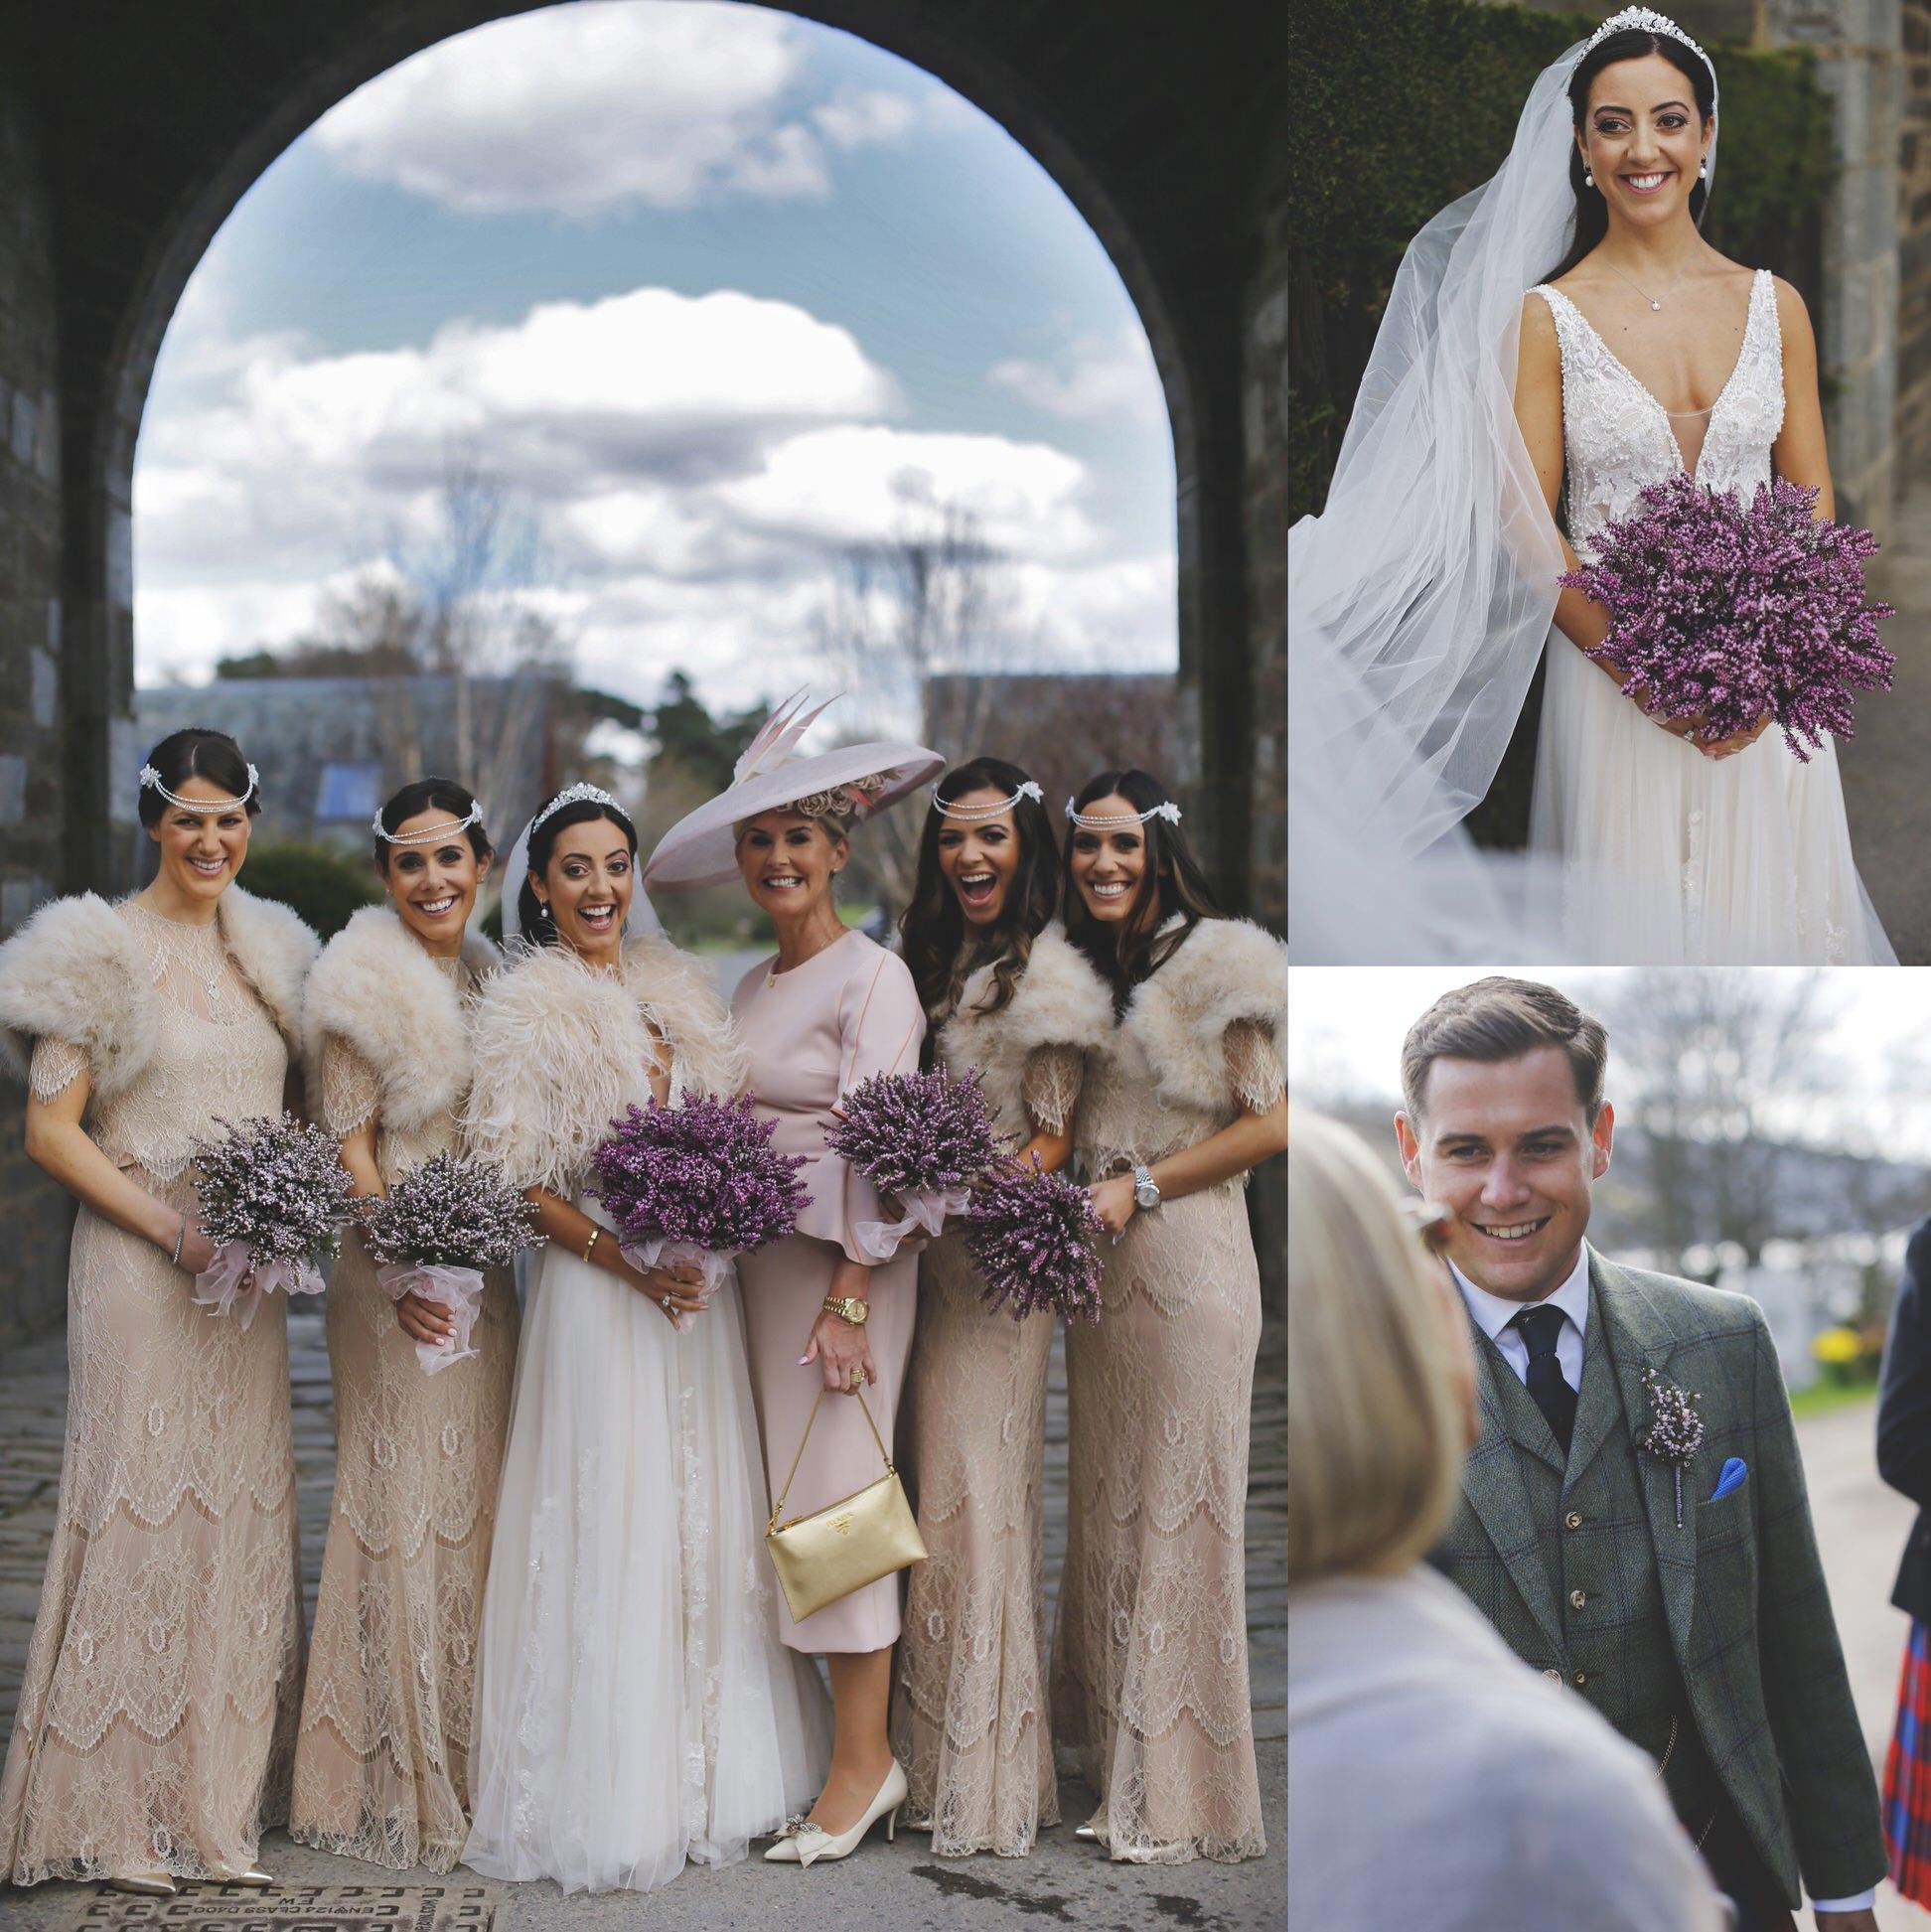 brett-harkness-cotland-wedding-photographer-highland-wedding_0012.jpg